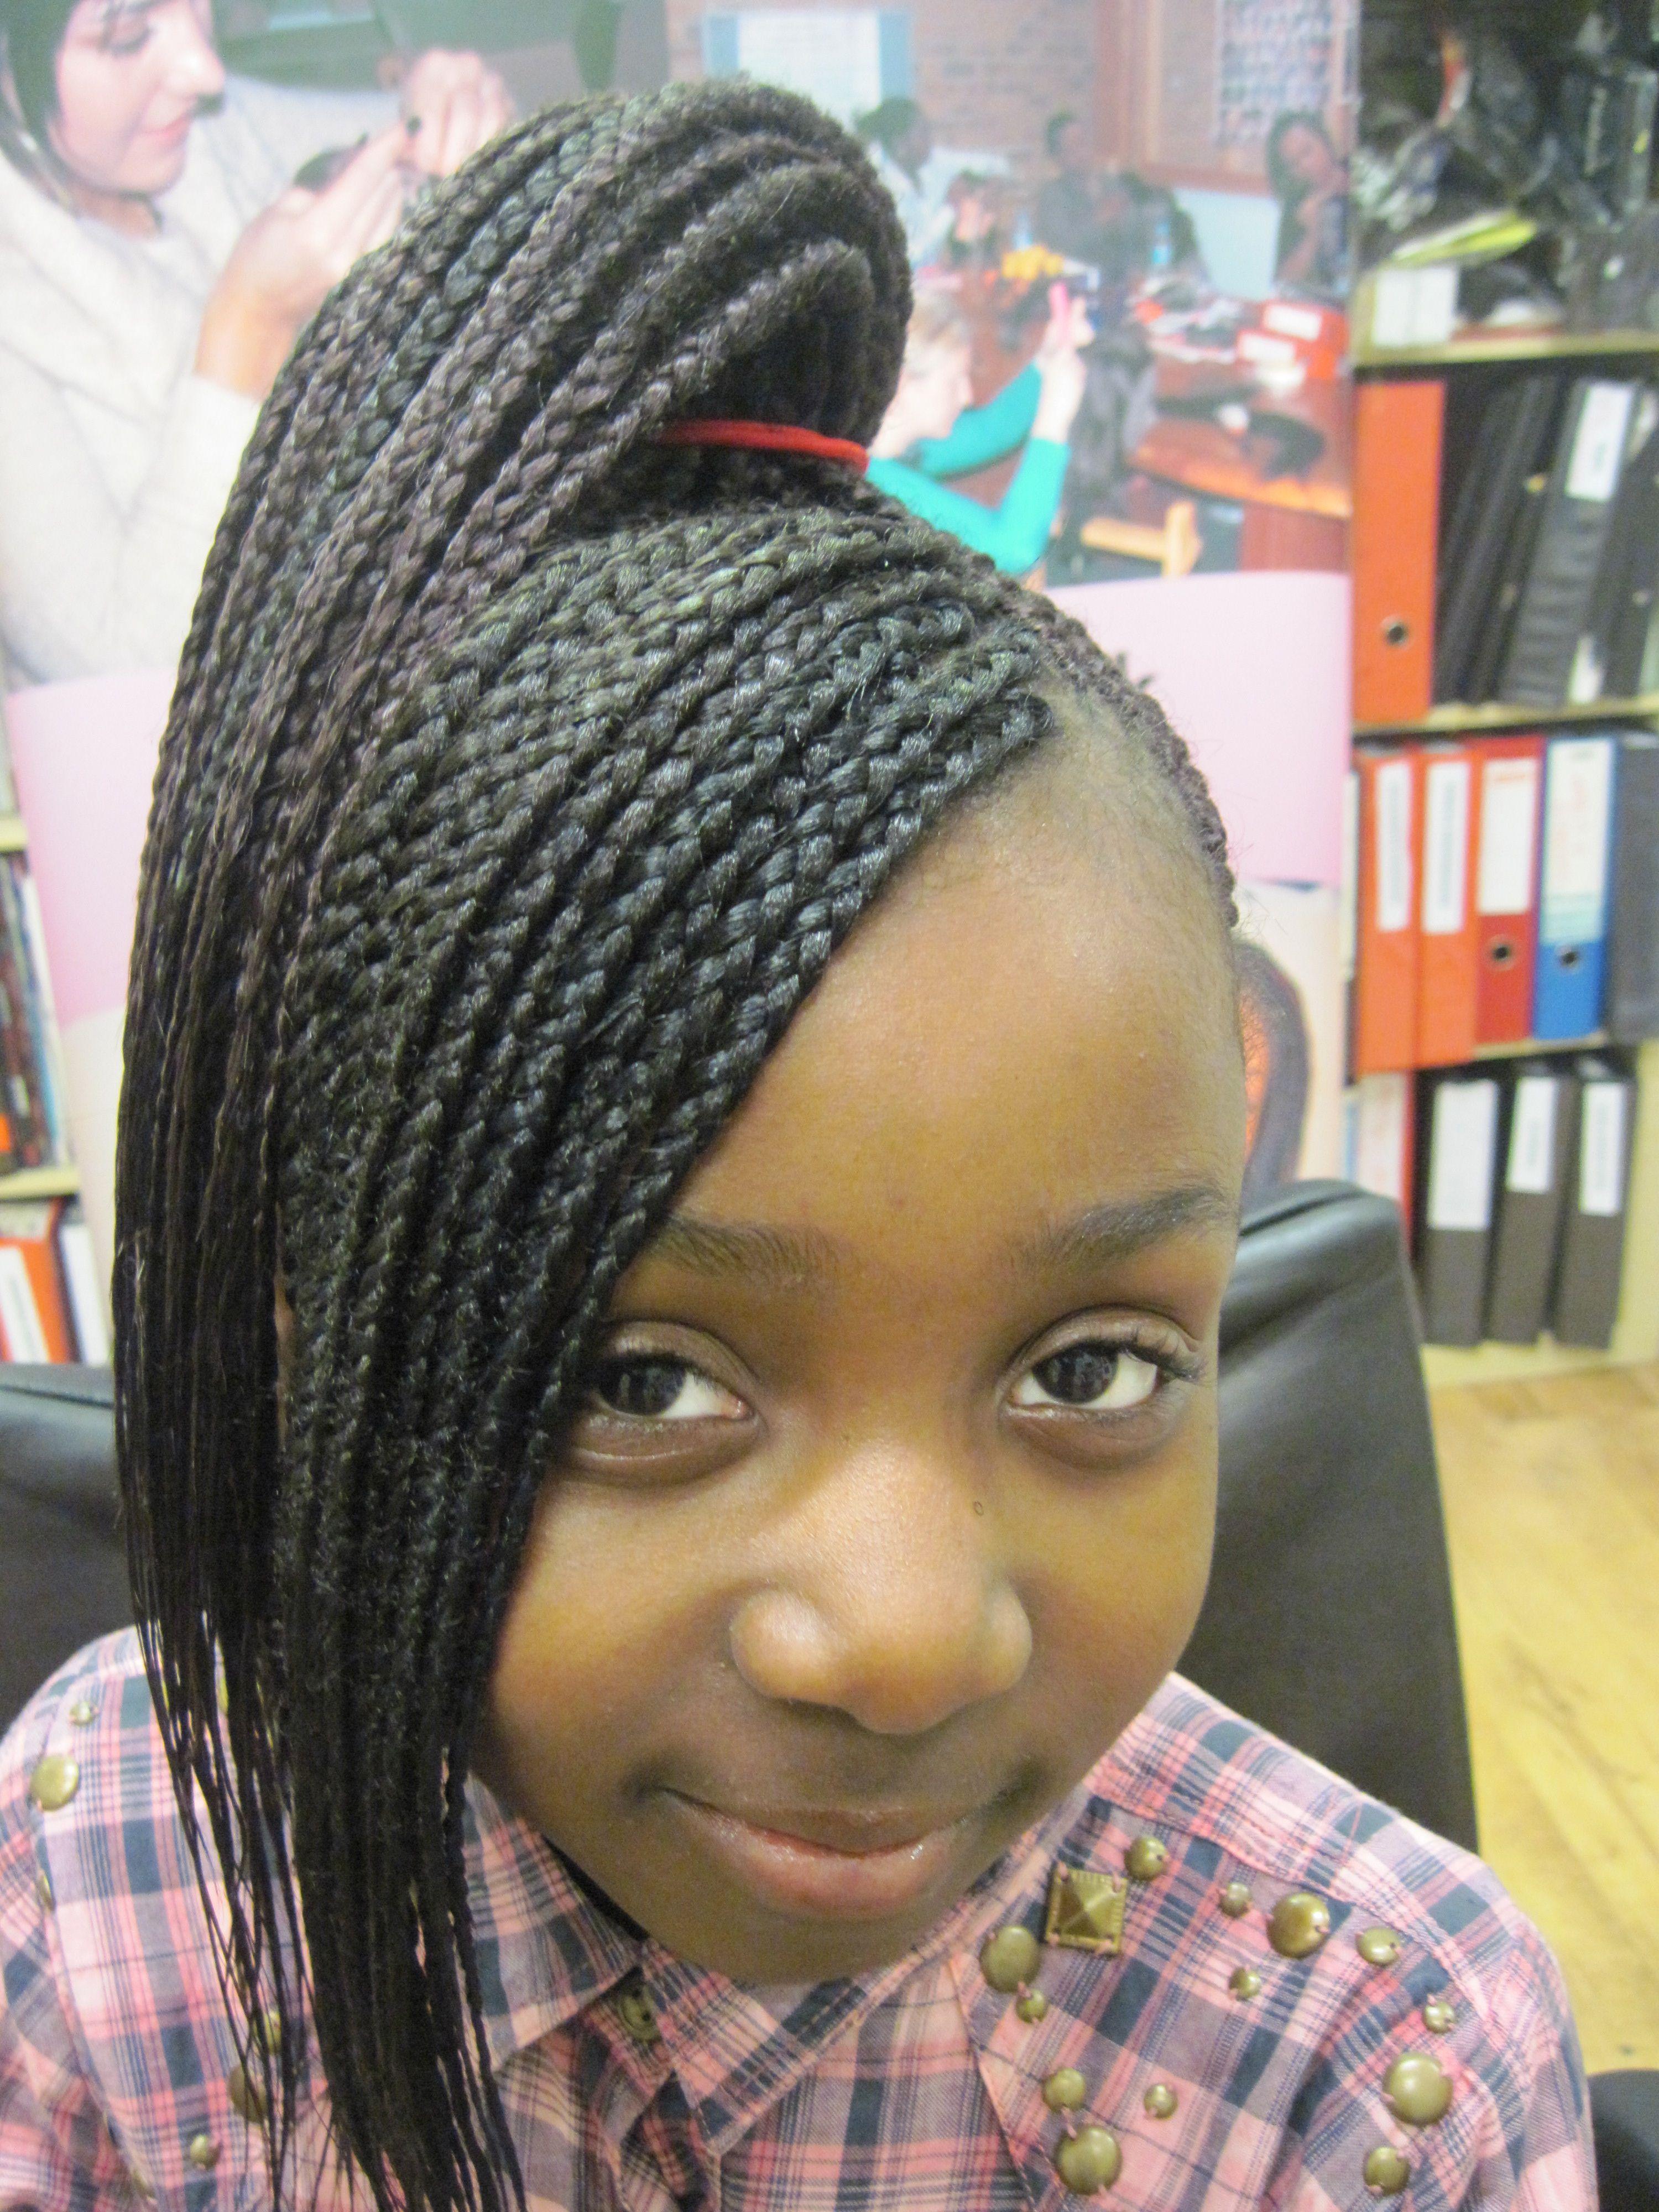 ghana cornrow braids with bangs - google search | weird blog